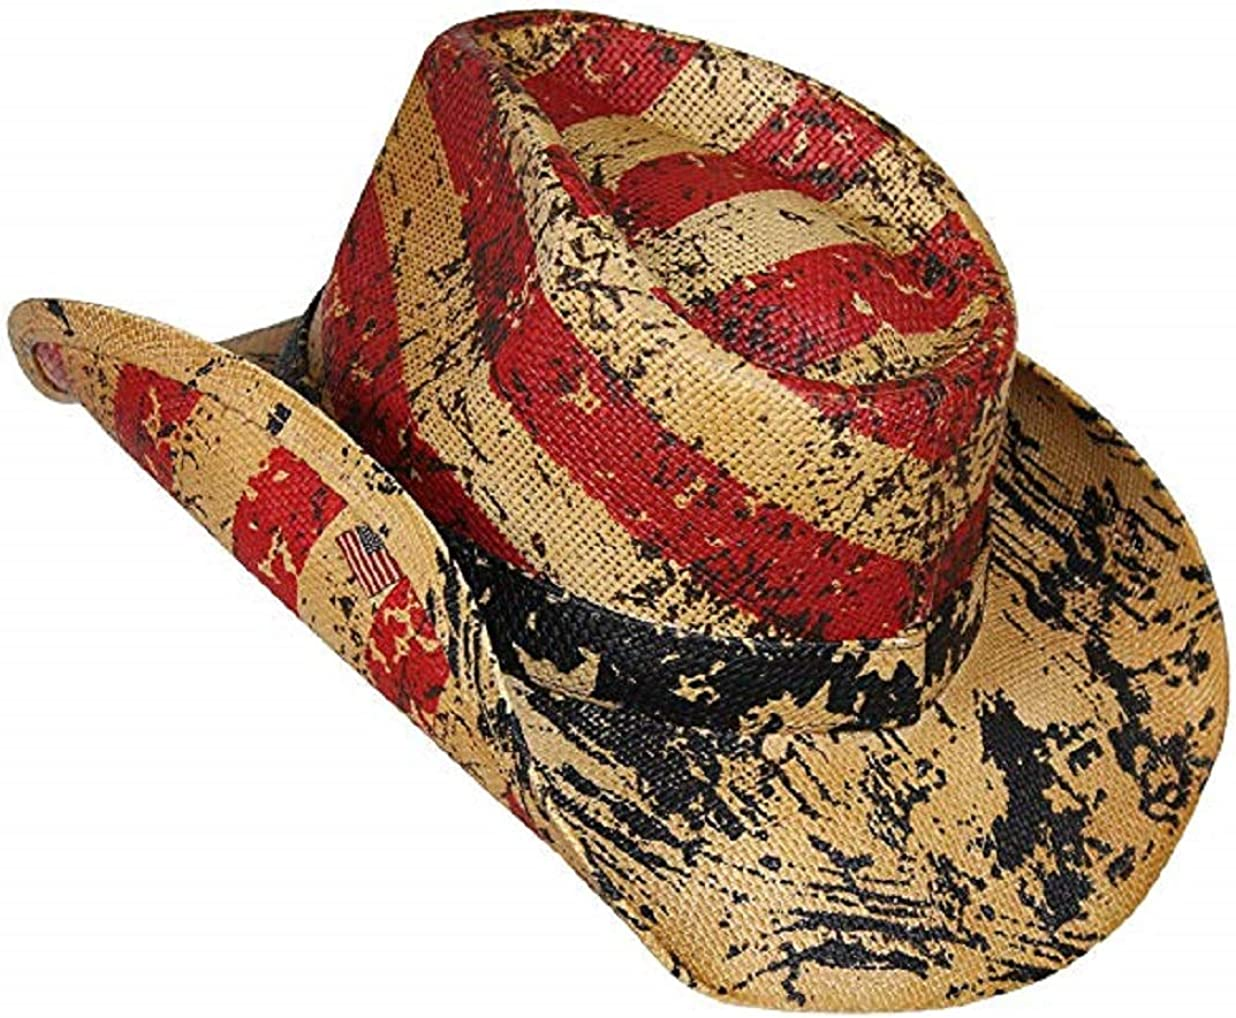 THAT HAT Straw Sun Cowboy Cowgirl Fashionista Vintage High Fashion Brown Ribbon Garden Cool Rattan Woven Cowboy Country Western